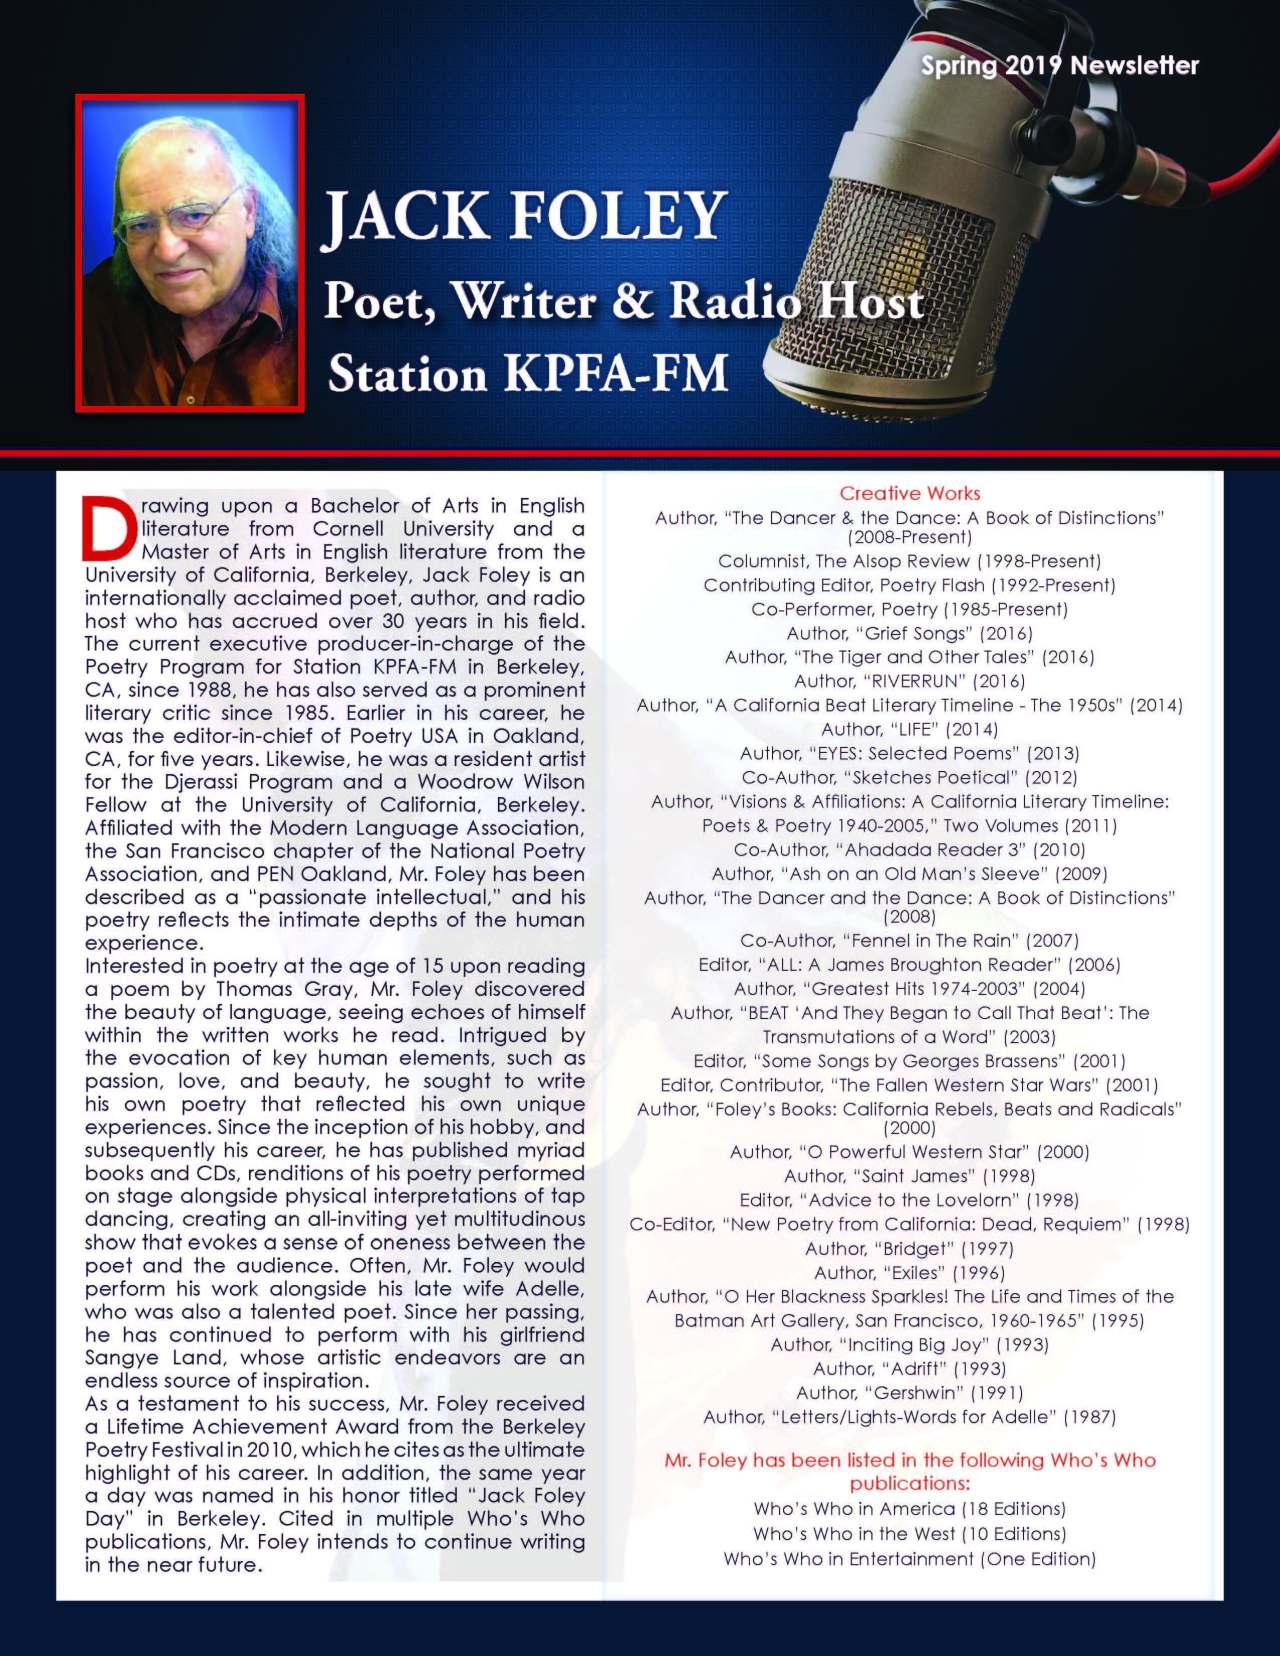 Foley, Jack 4112575_23396161 Newsletter REVISED.jpg